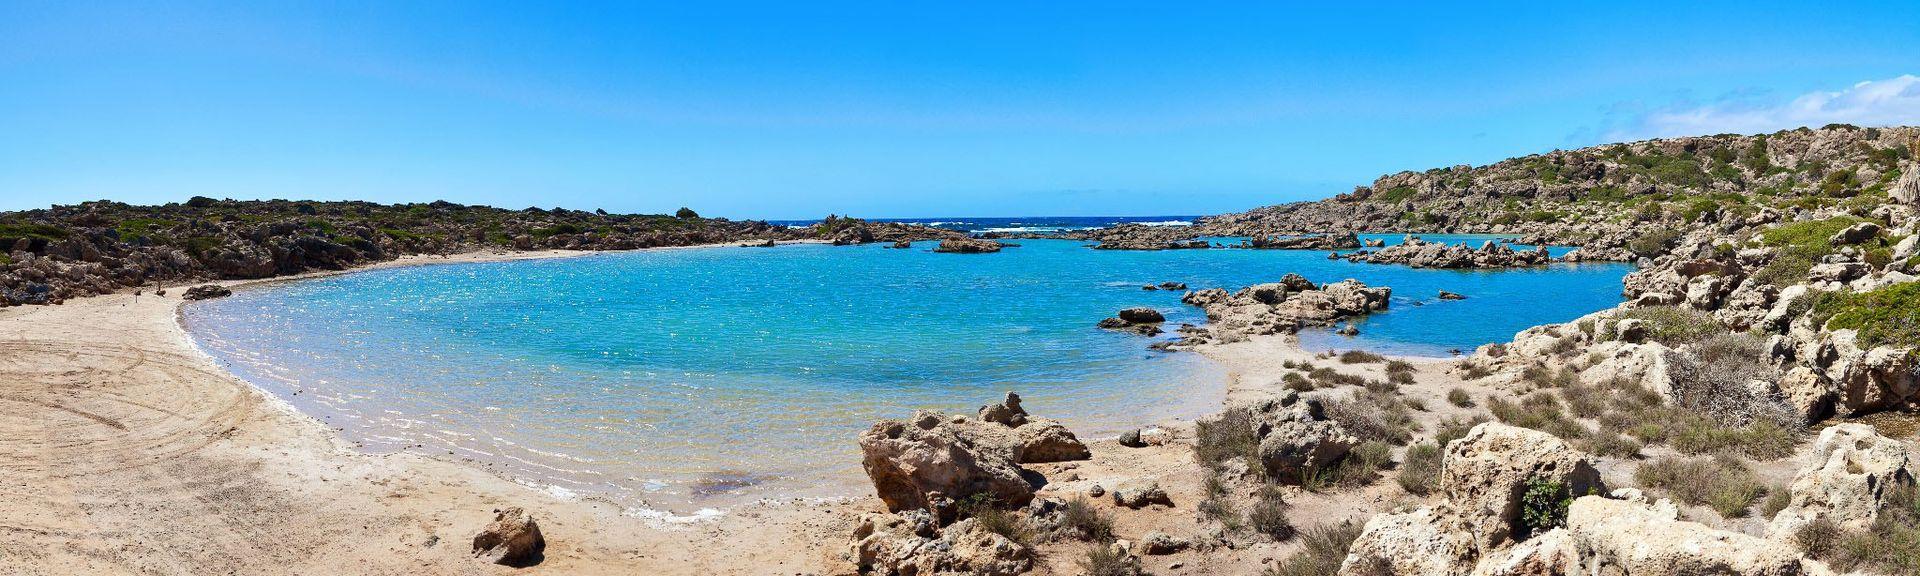 Praia de Falassarna, Kissamos, Creta, Grécia